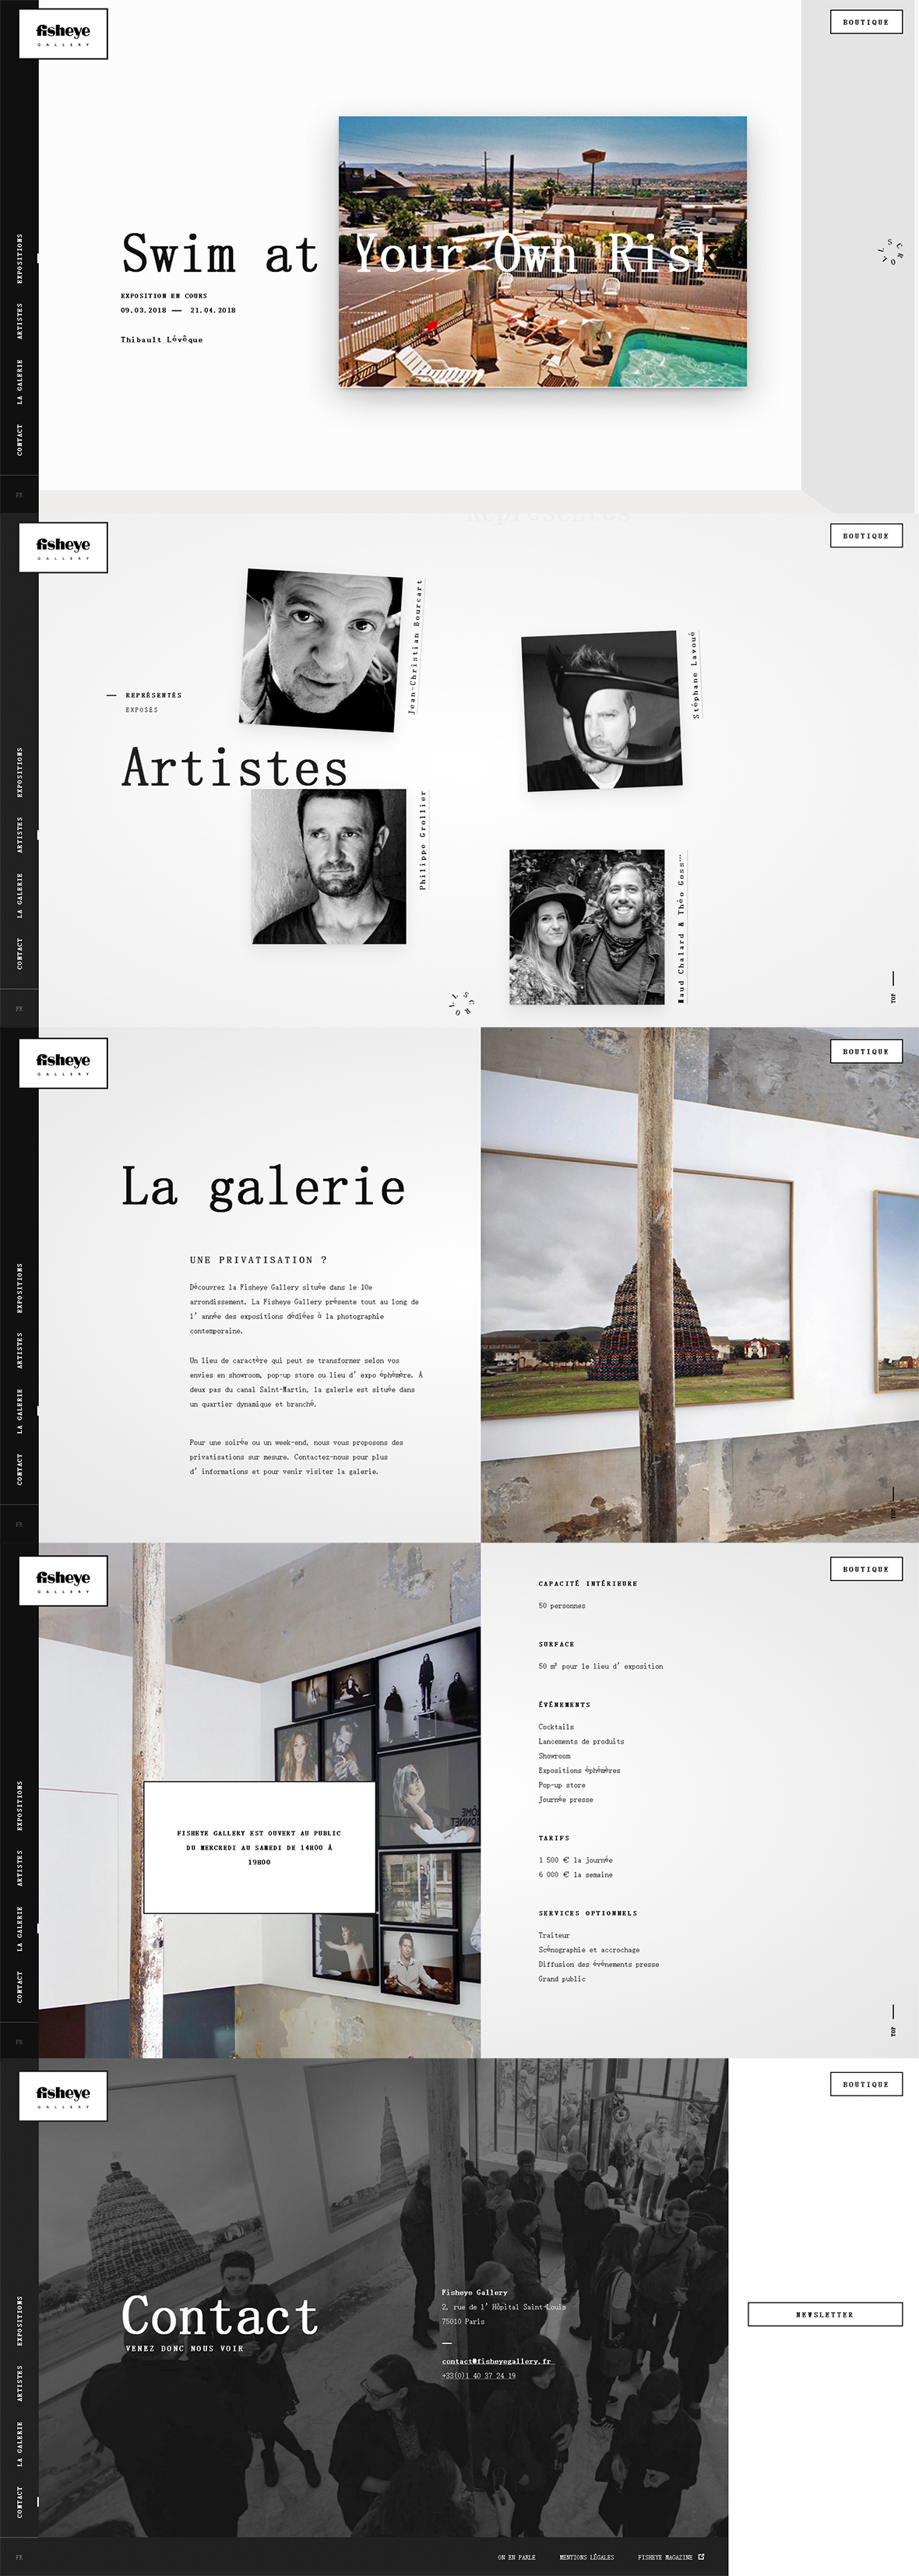 Fisheye Gallery-创意,网页设计,创意设计,创意网站,网站设计,创意作品,设计作品,网站欣赏,优,ui设计,设计,设计师,优秀设计